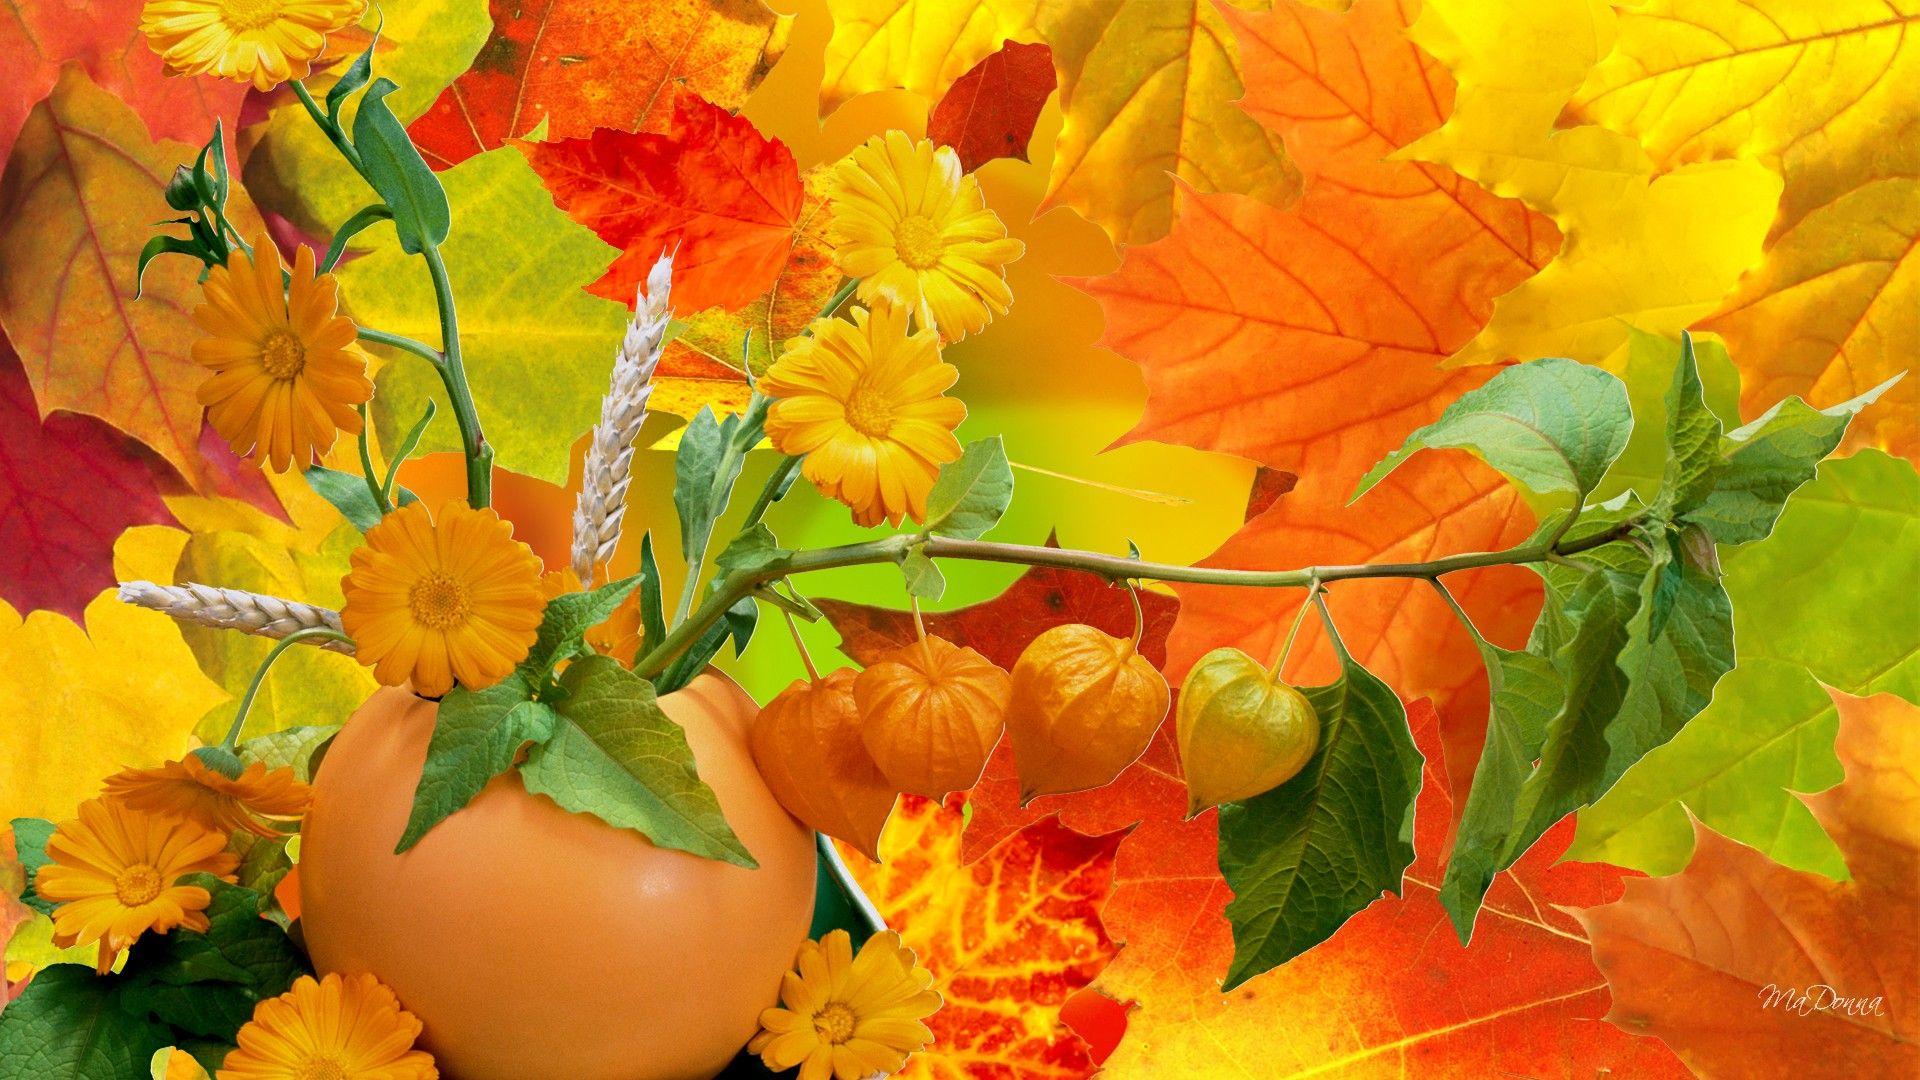 Wallpaper download free image search hd - Hd Abundance Of Fall Colors Wallpaper Download Free 60021